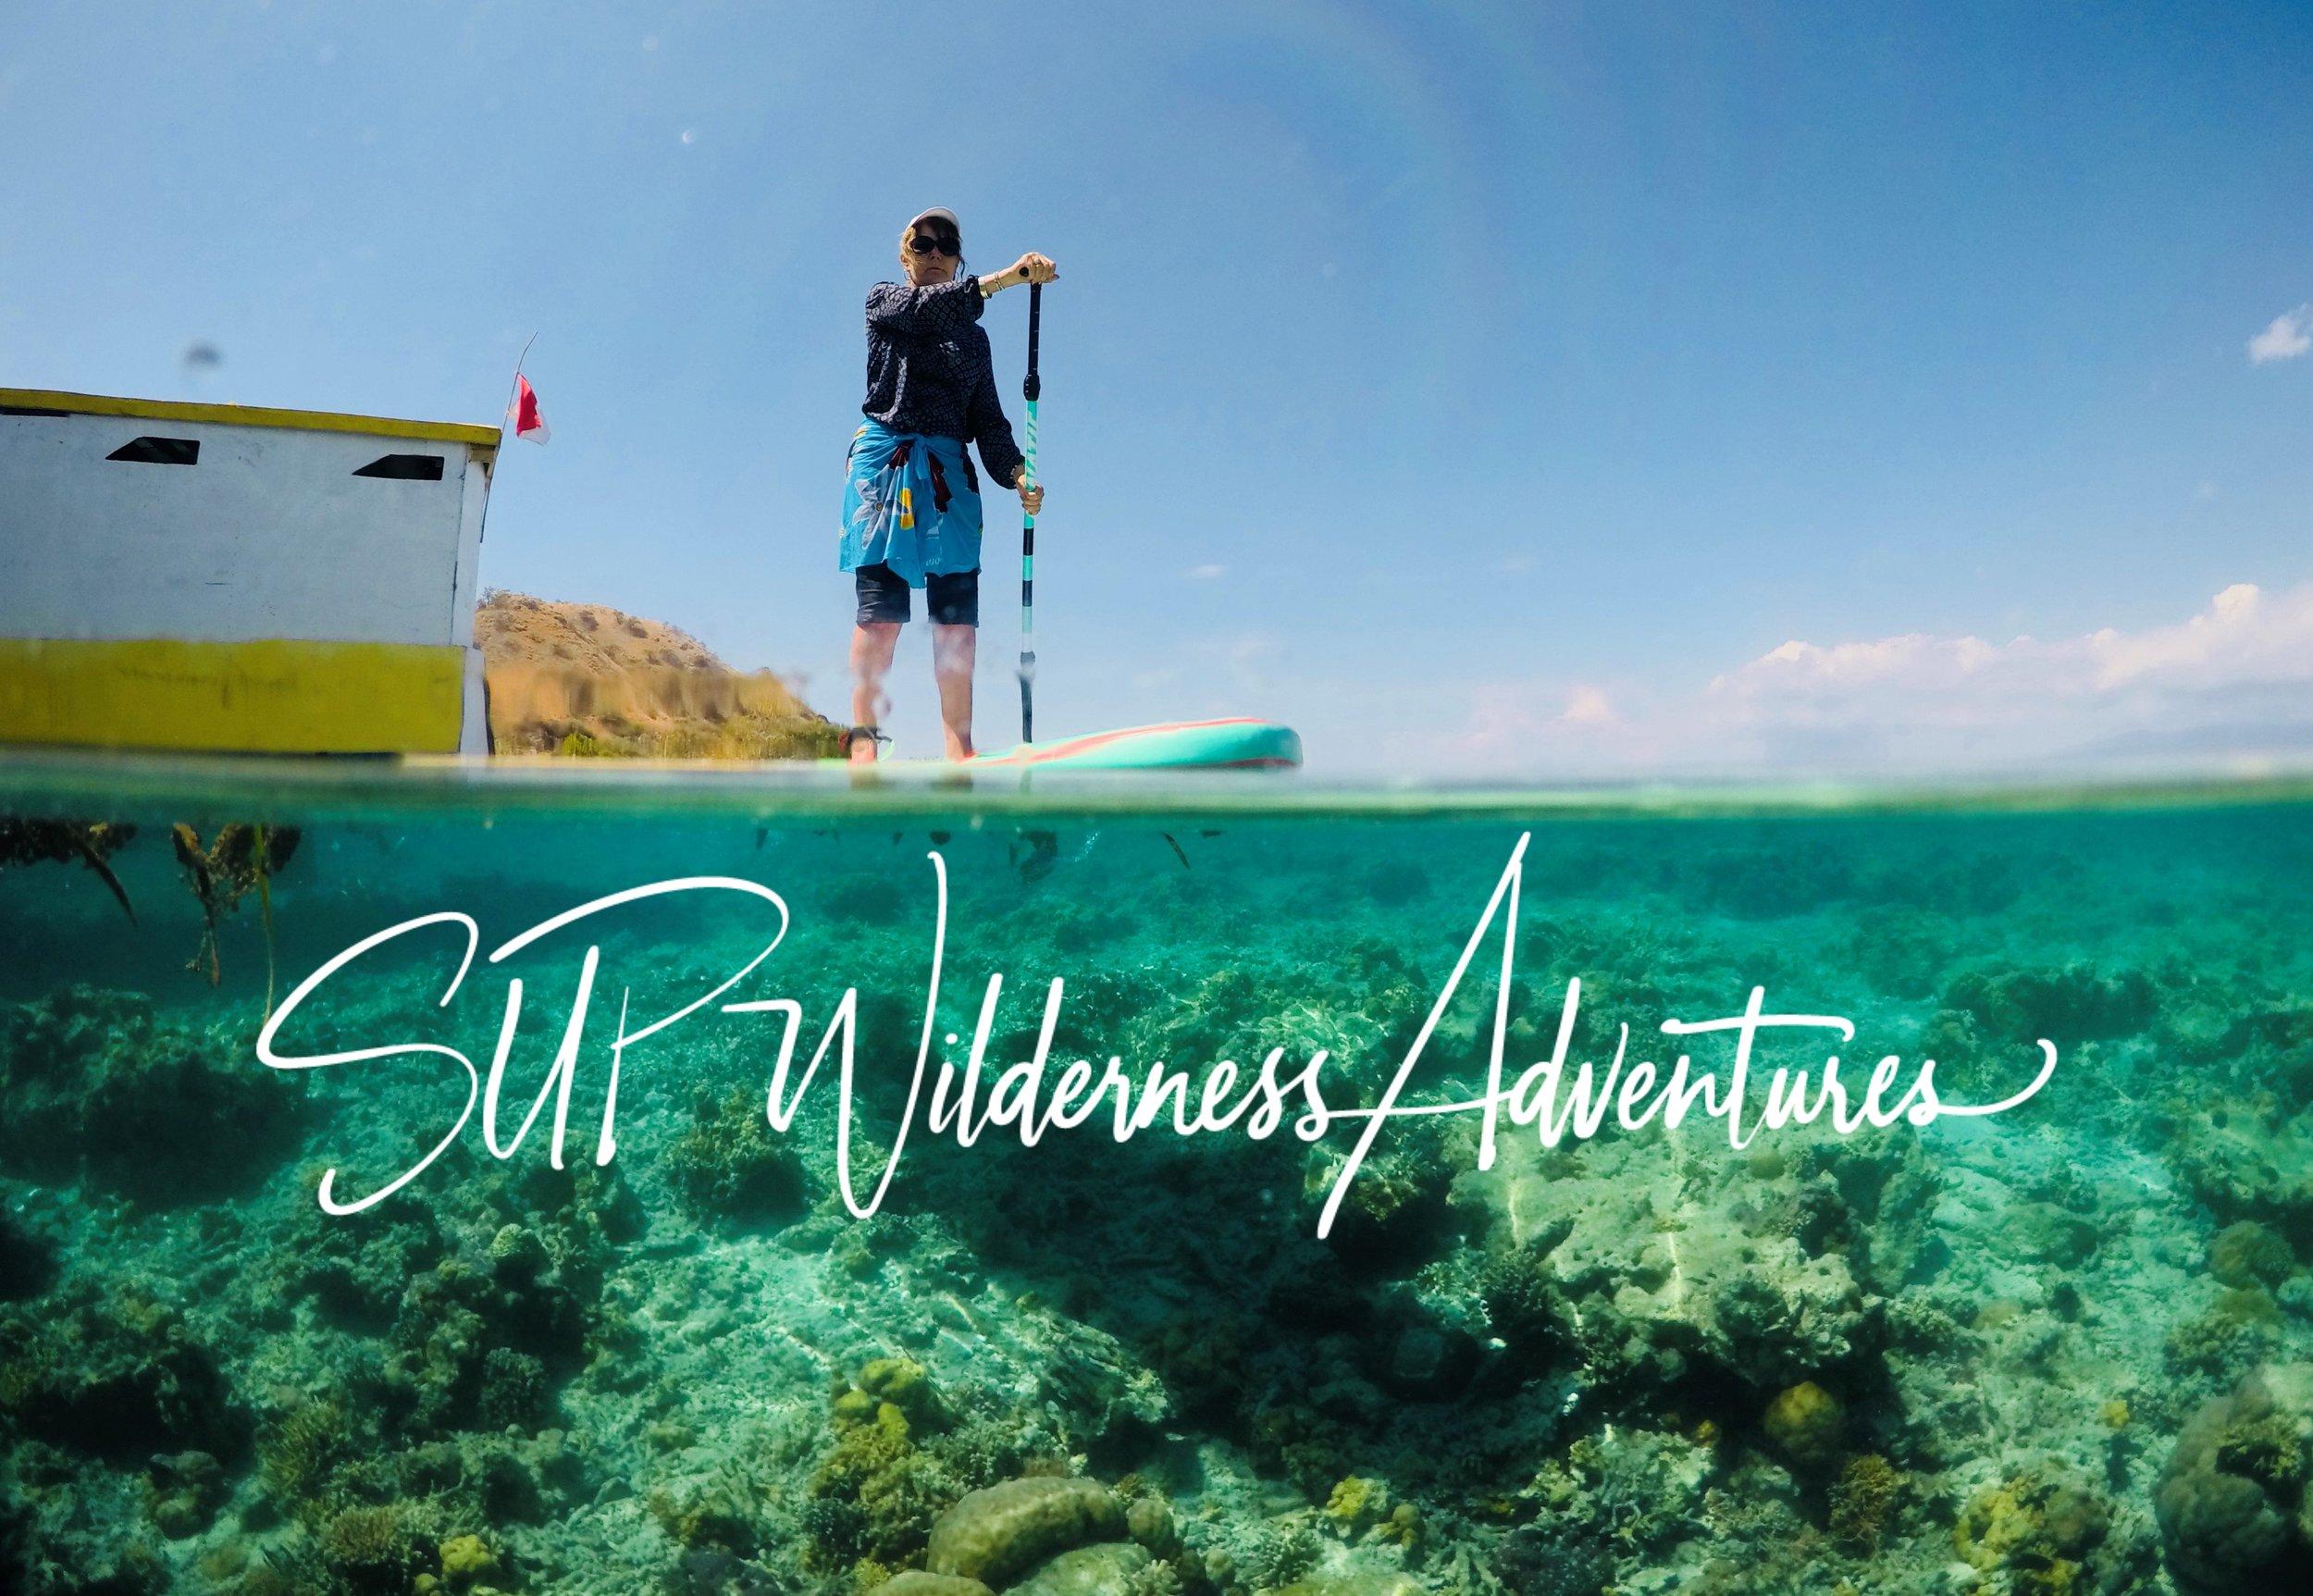 SUP Wilderness Adventures paddling Komodo Aug 2018 (12).jpg